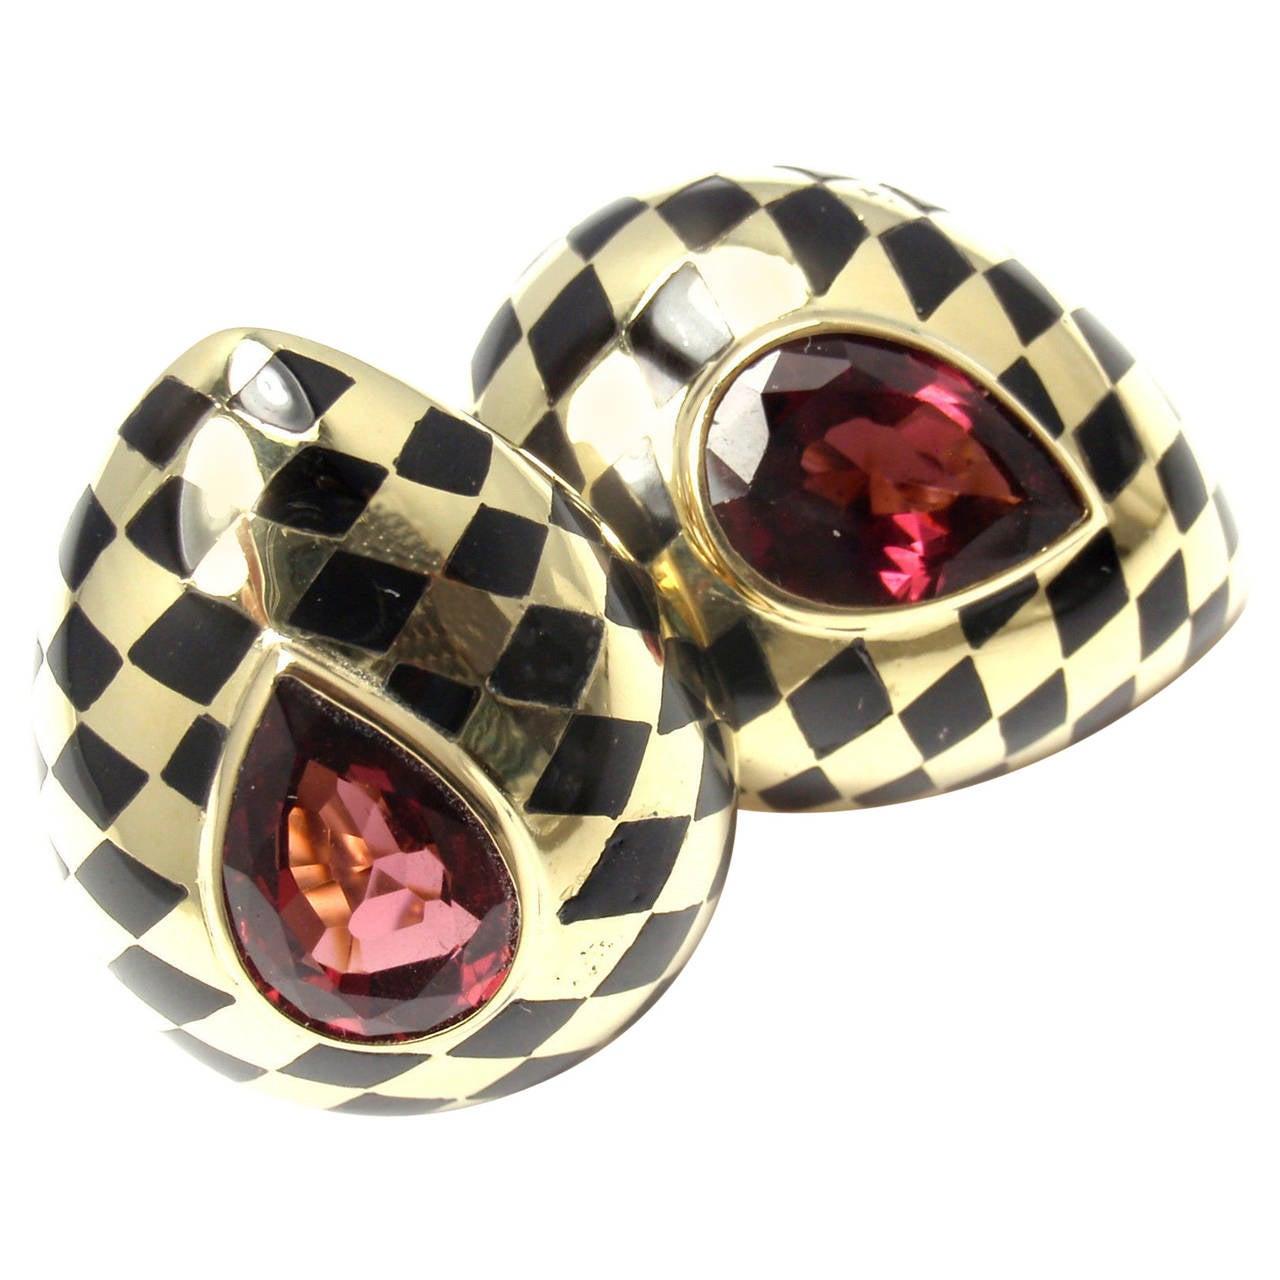 Angela Cummings Black Jade Inlay Pink Tourmaline Gold Earrings